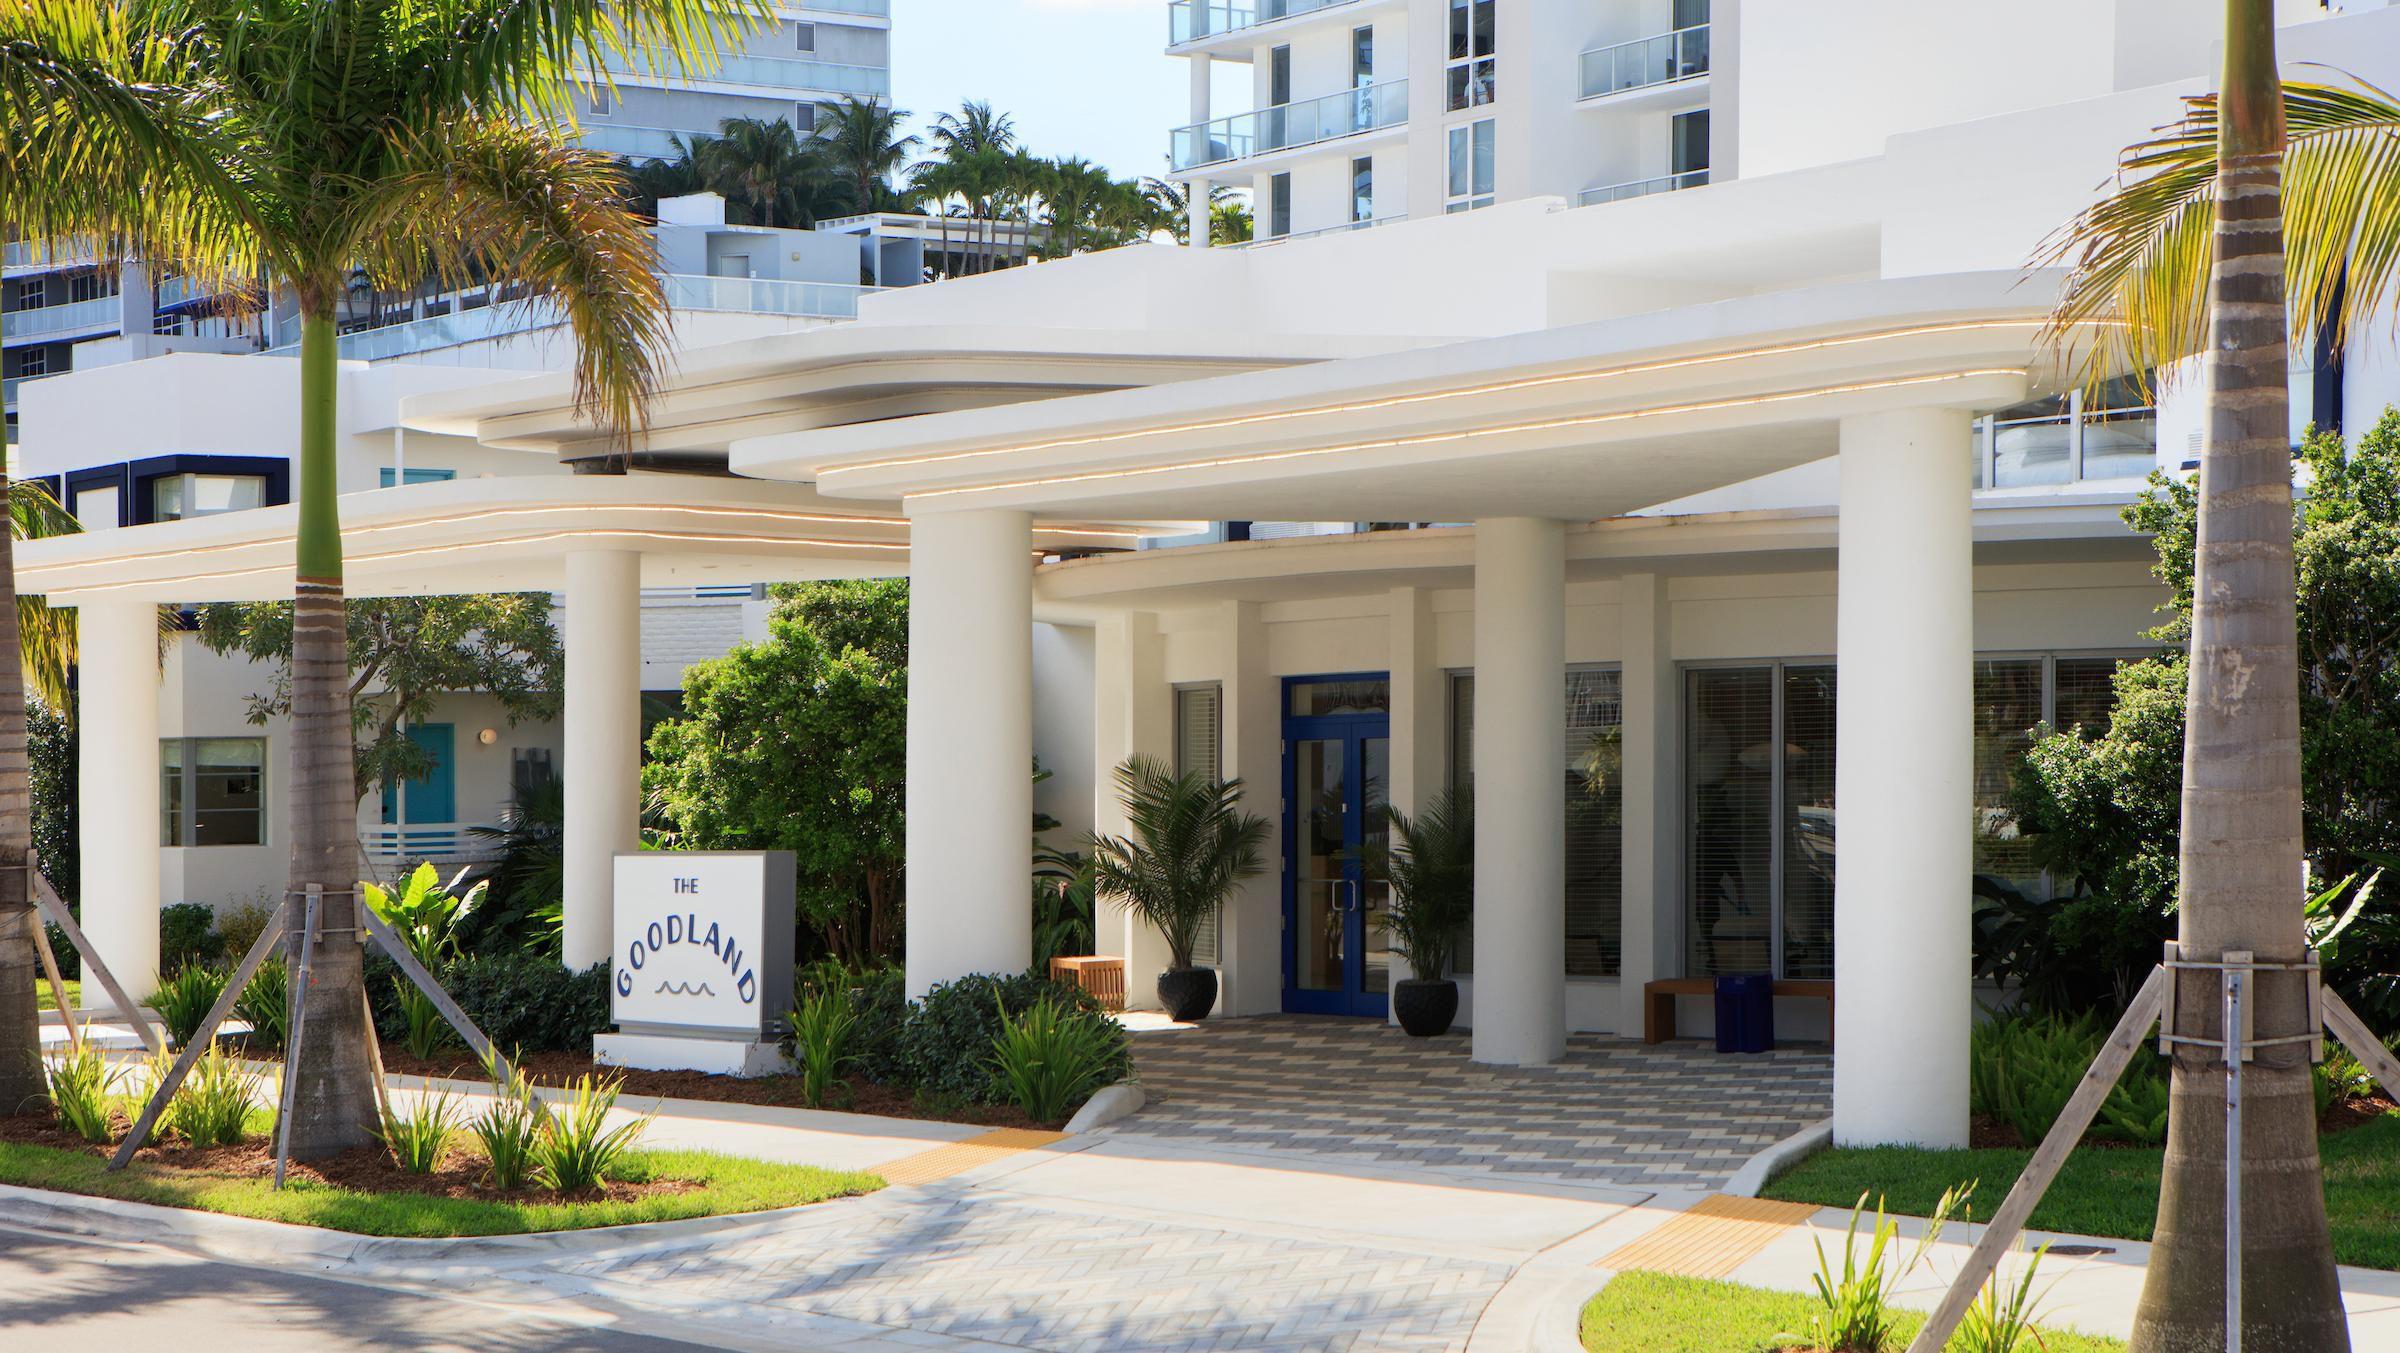 The Goodland Fort Lauderdale Beach